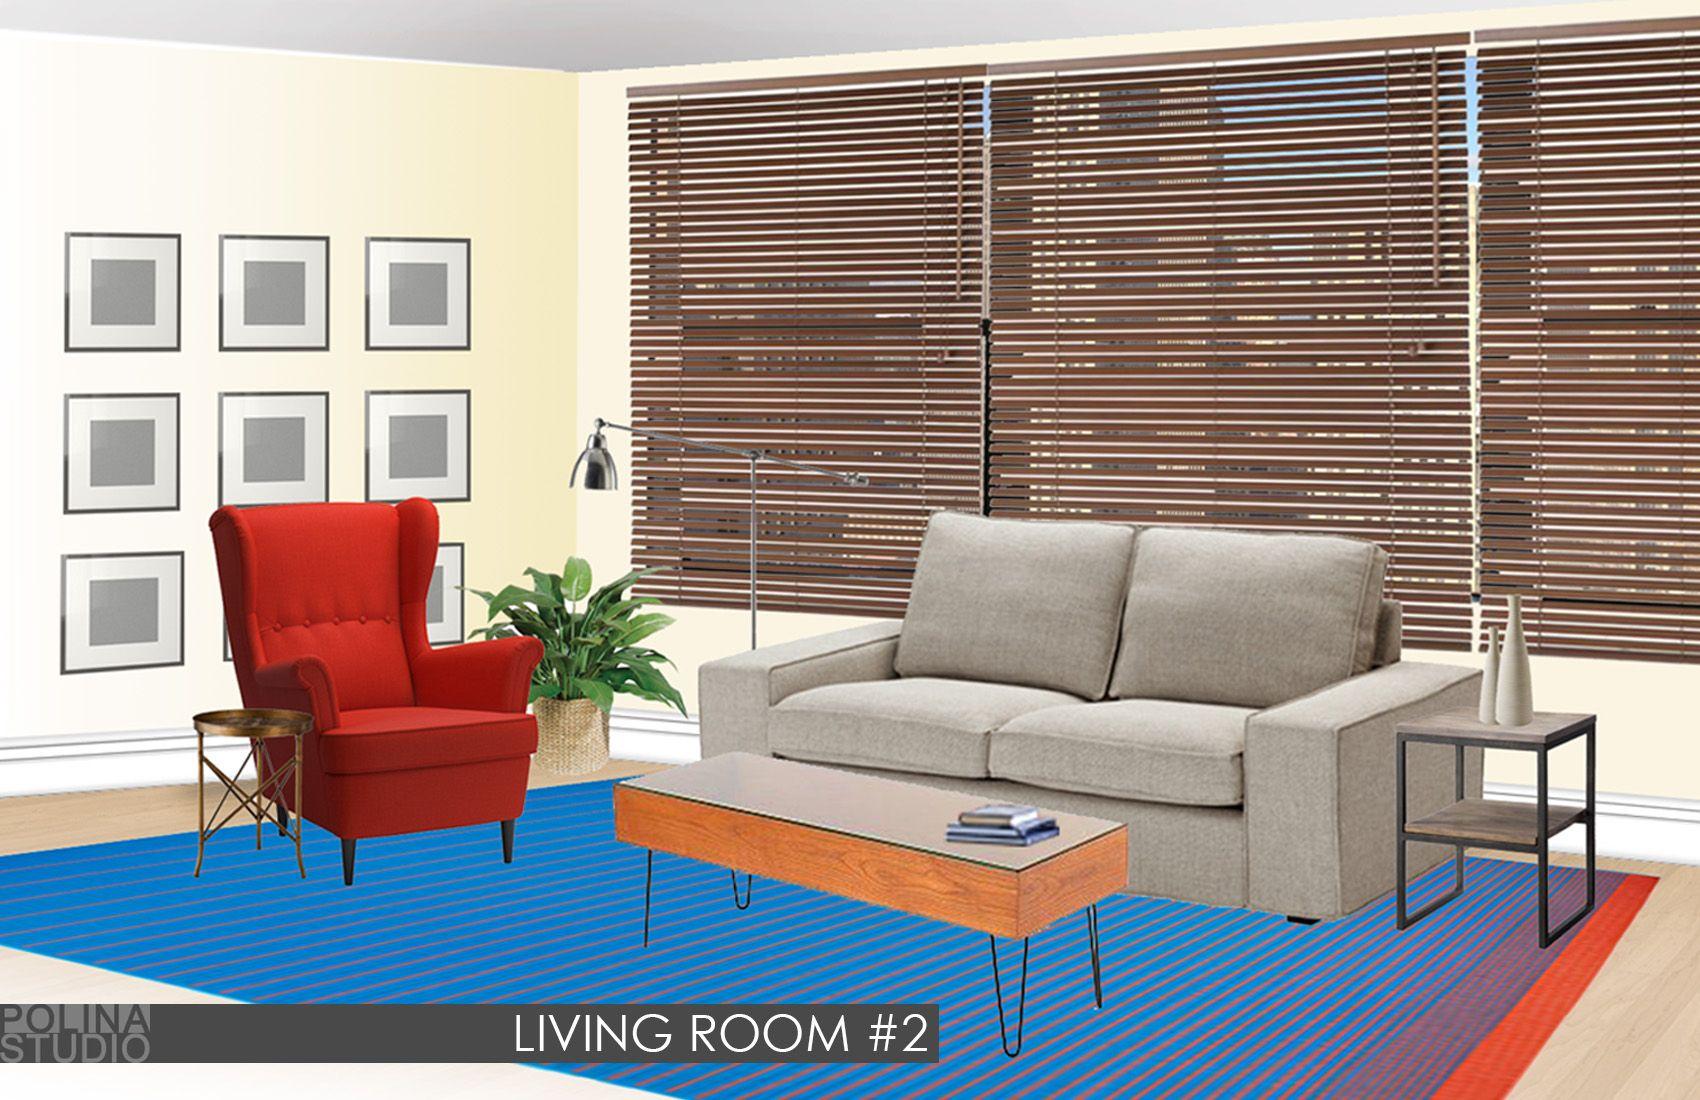 #affordableinterior #affordabledecor #livingroom #creative #house  #modern #interiordesign  #urban #design #interior #renovation #remodeling  #doityourself #unique  #style  #designer #decor #crafts #project #decoration @ www.polinastudio.com